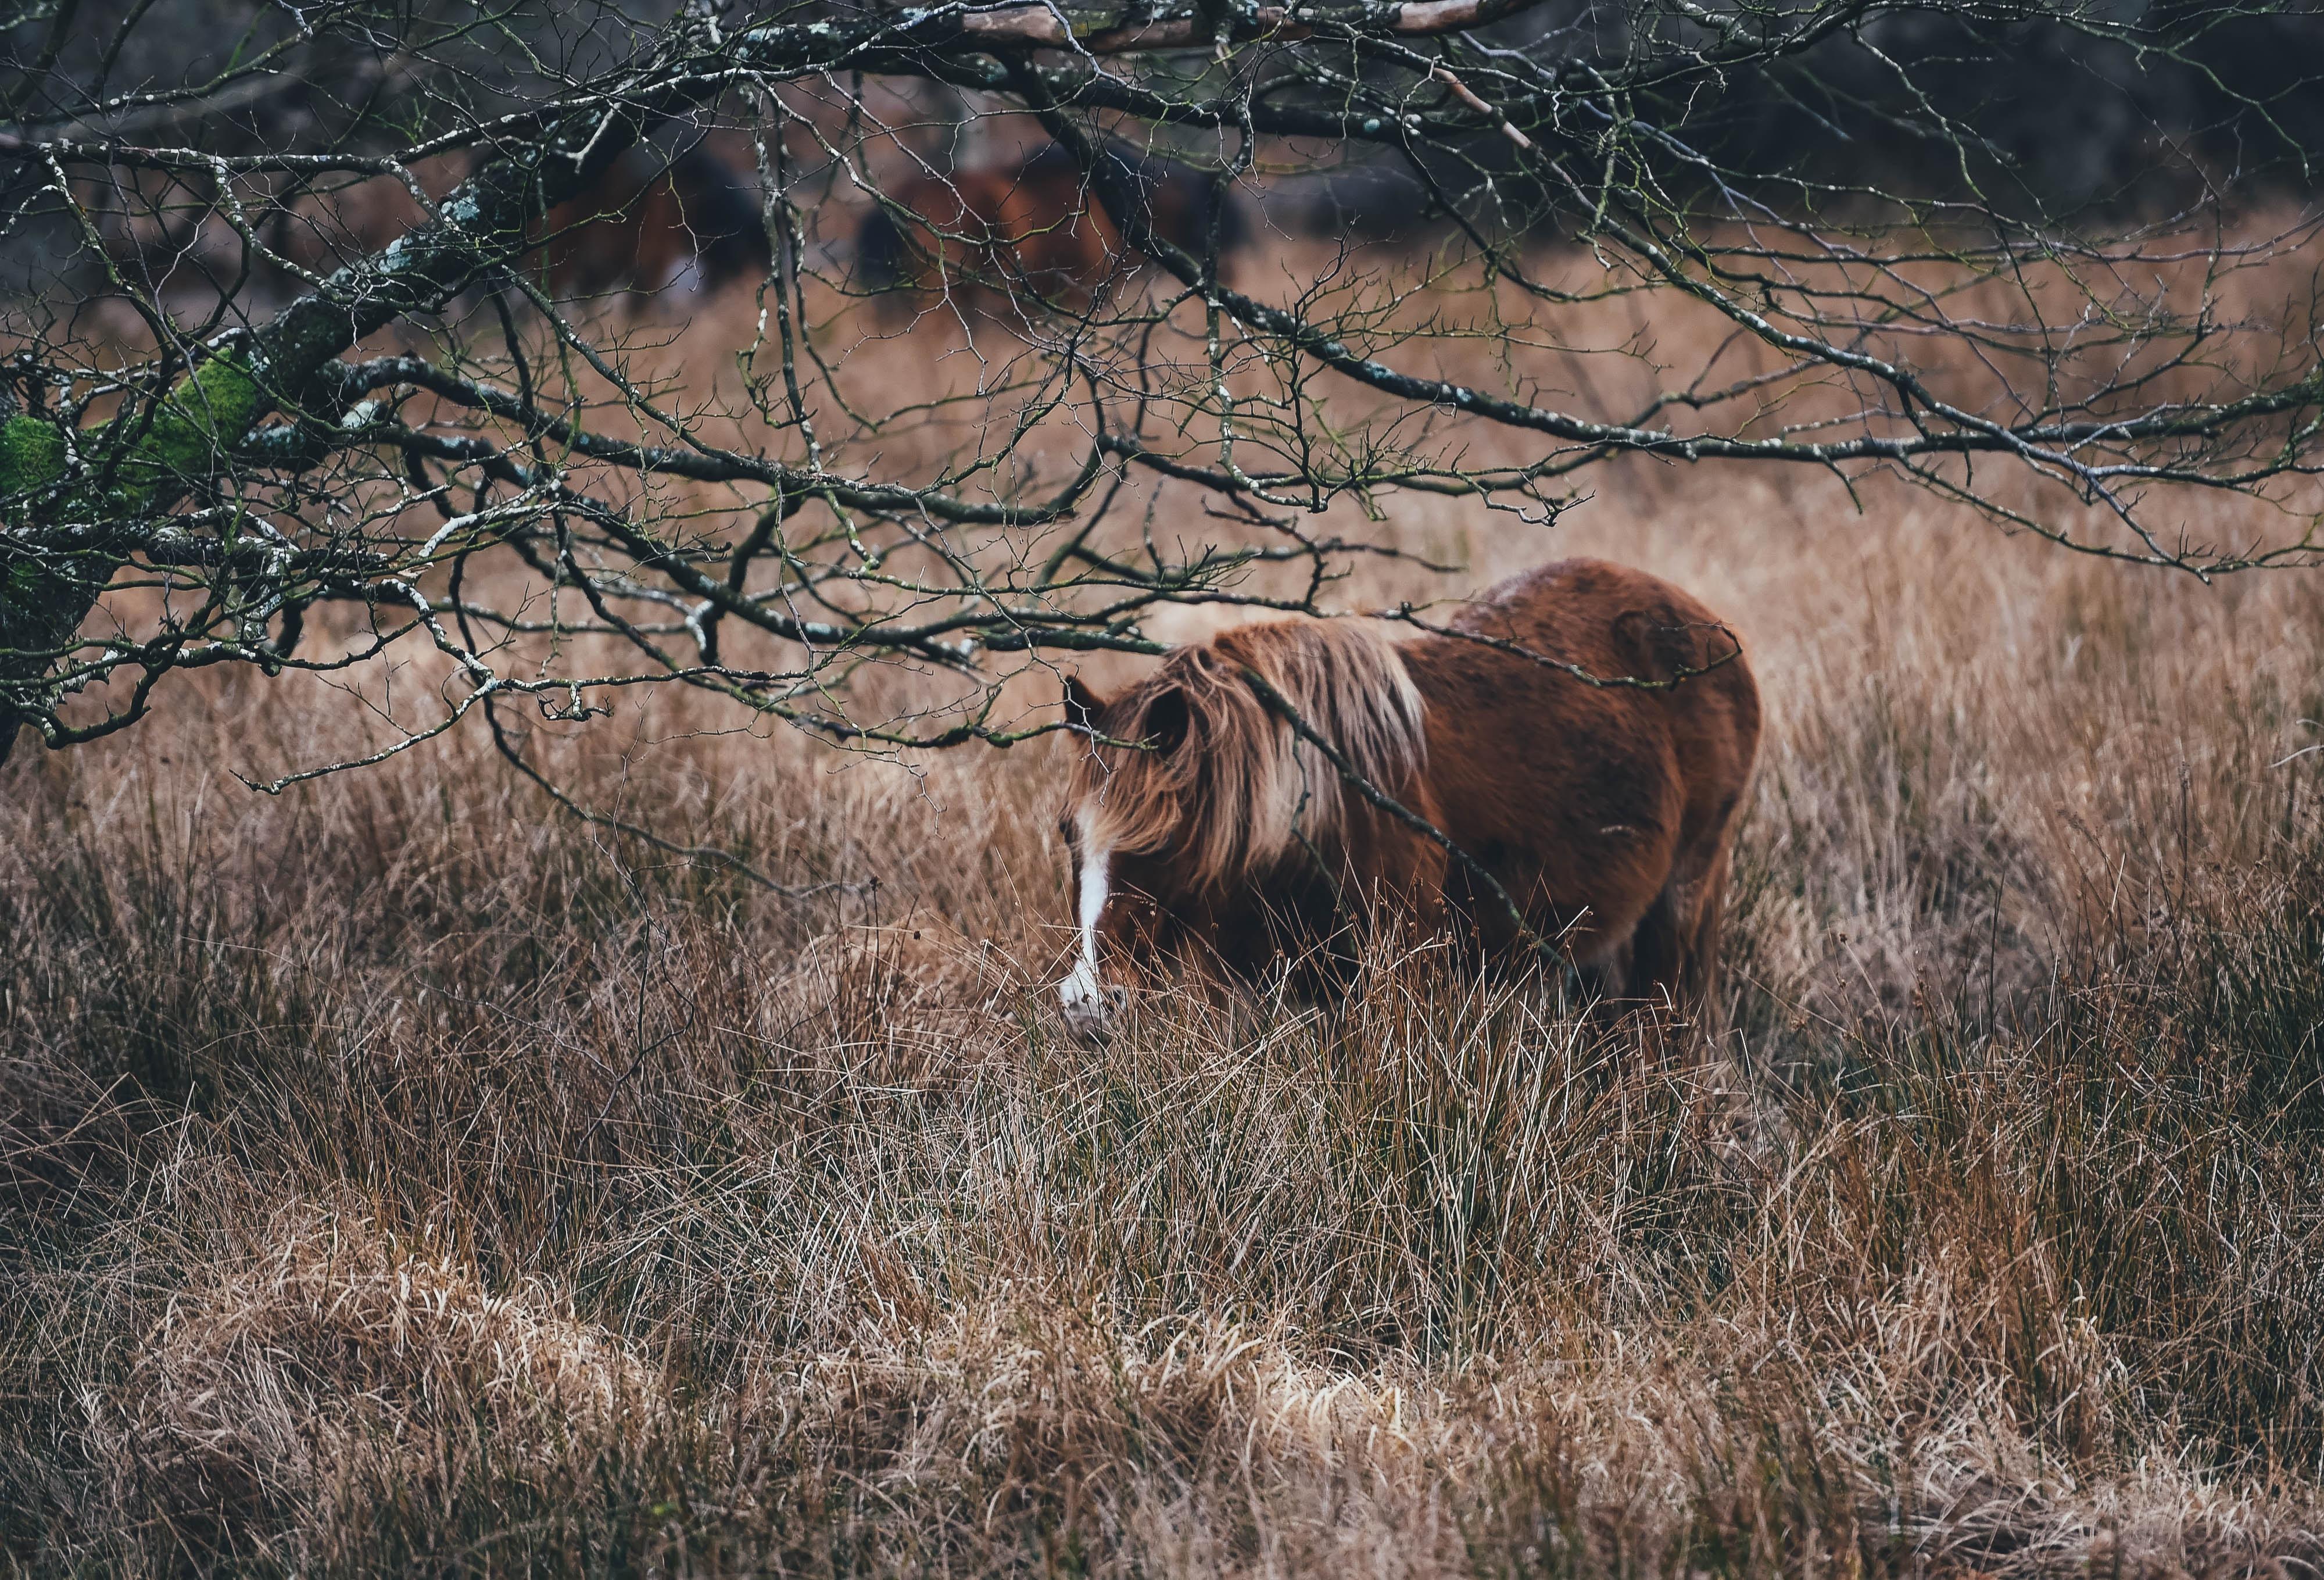 A shaggy brown horse walking through tall dry grass under a bare tree